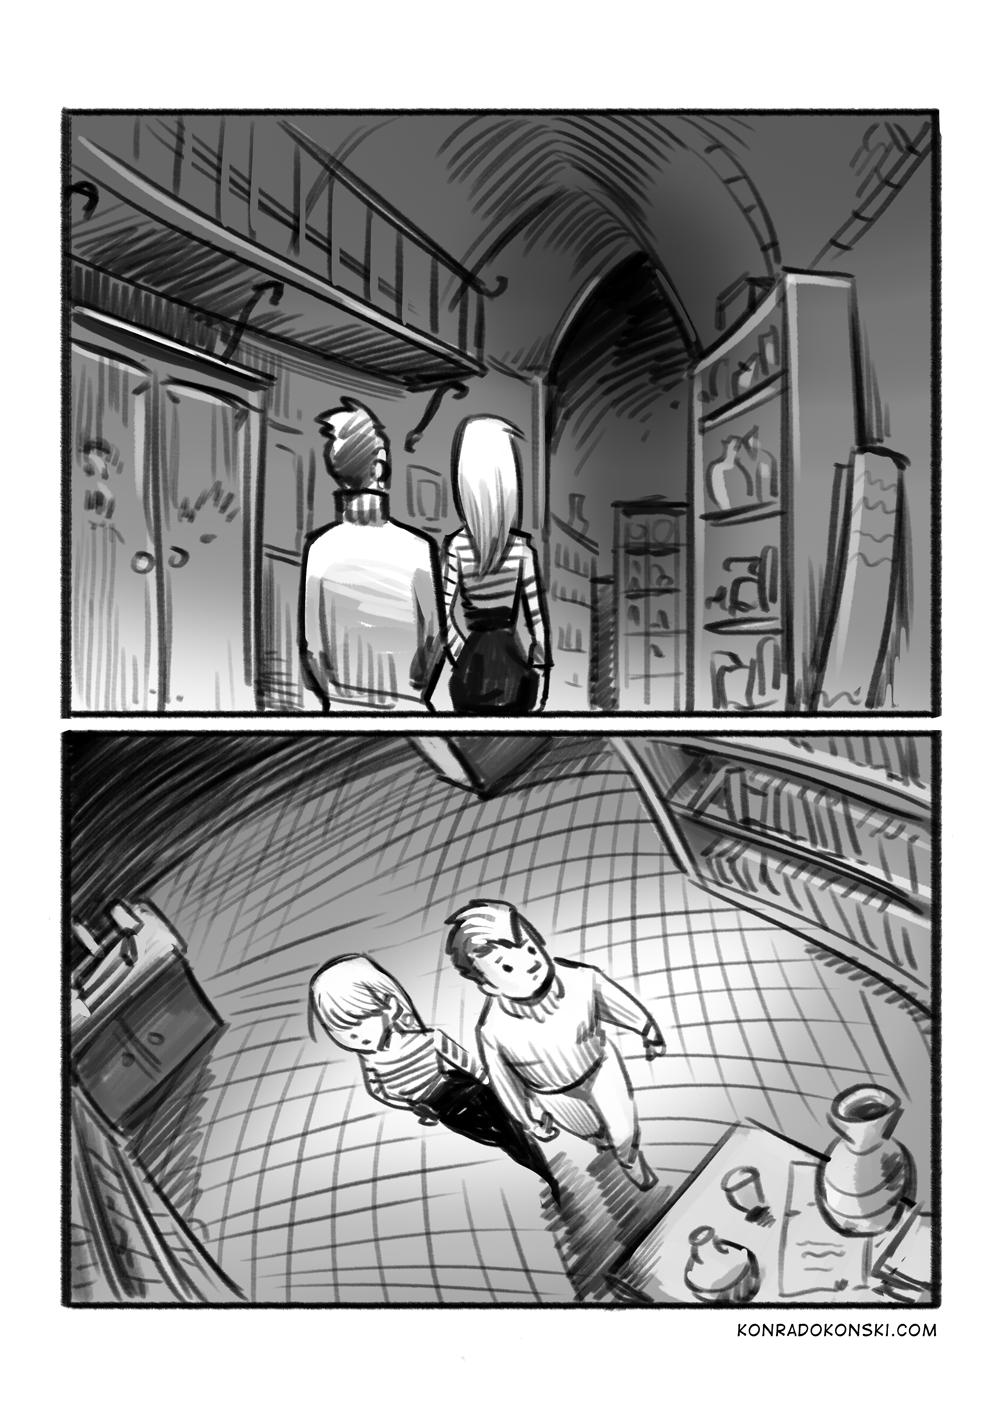 Gratka – komiks 24h – 11